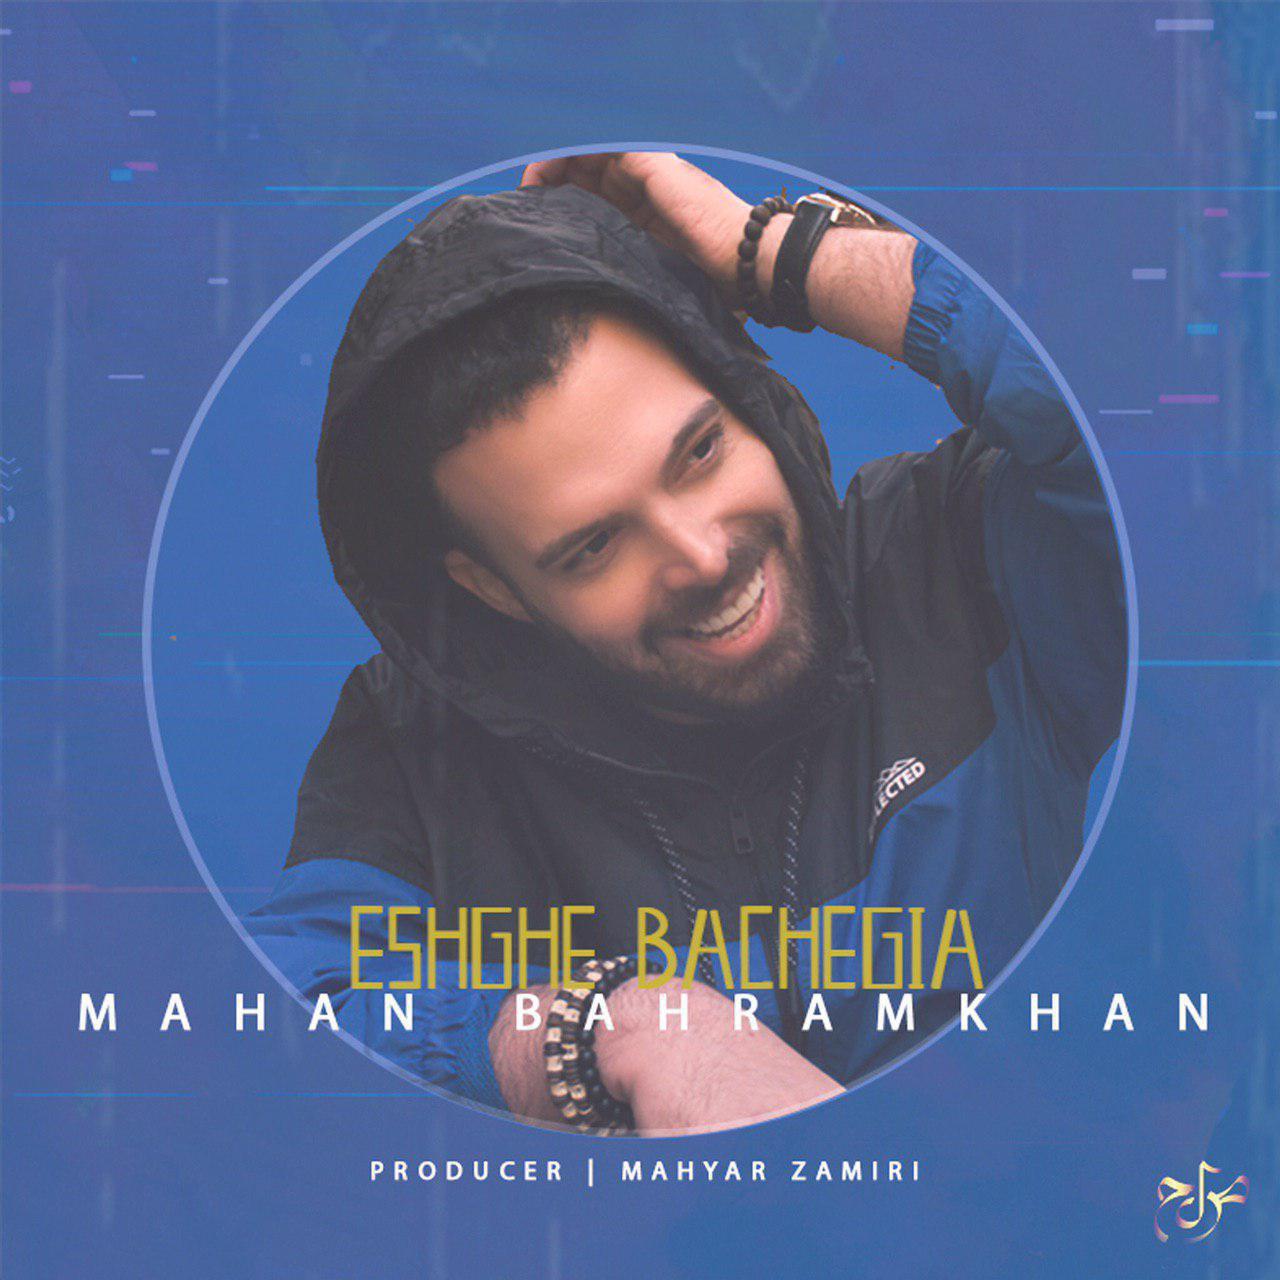 Mahan Bahramkhan - Eshghe Bachegia - دانلود آهنگ ماهان بهرام خان به نام عشق بچگیا